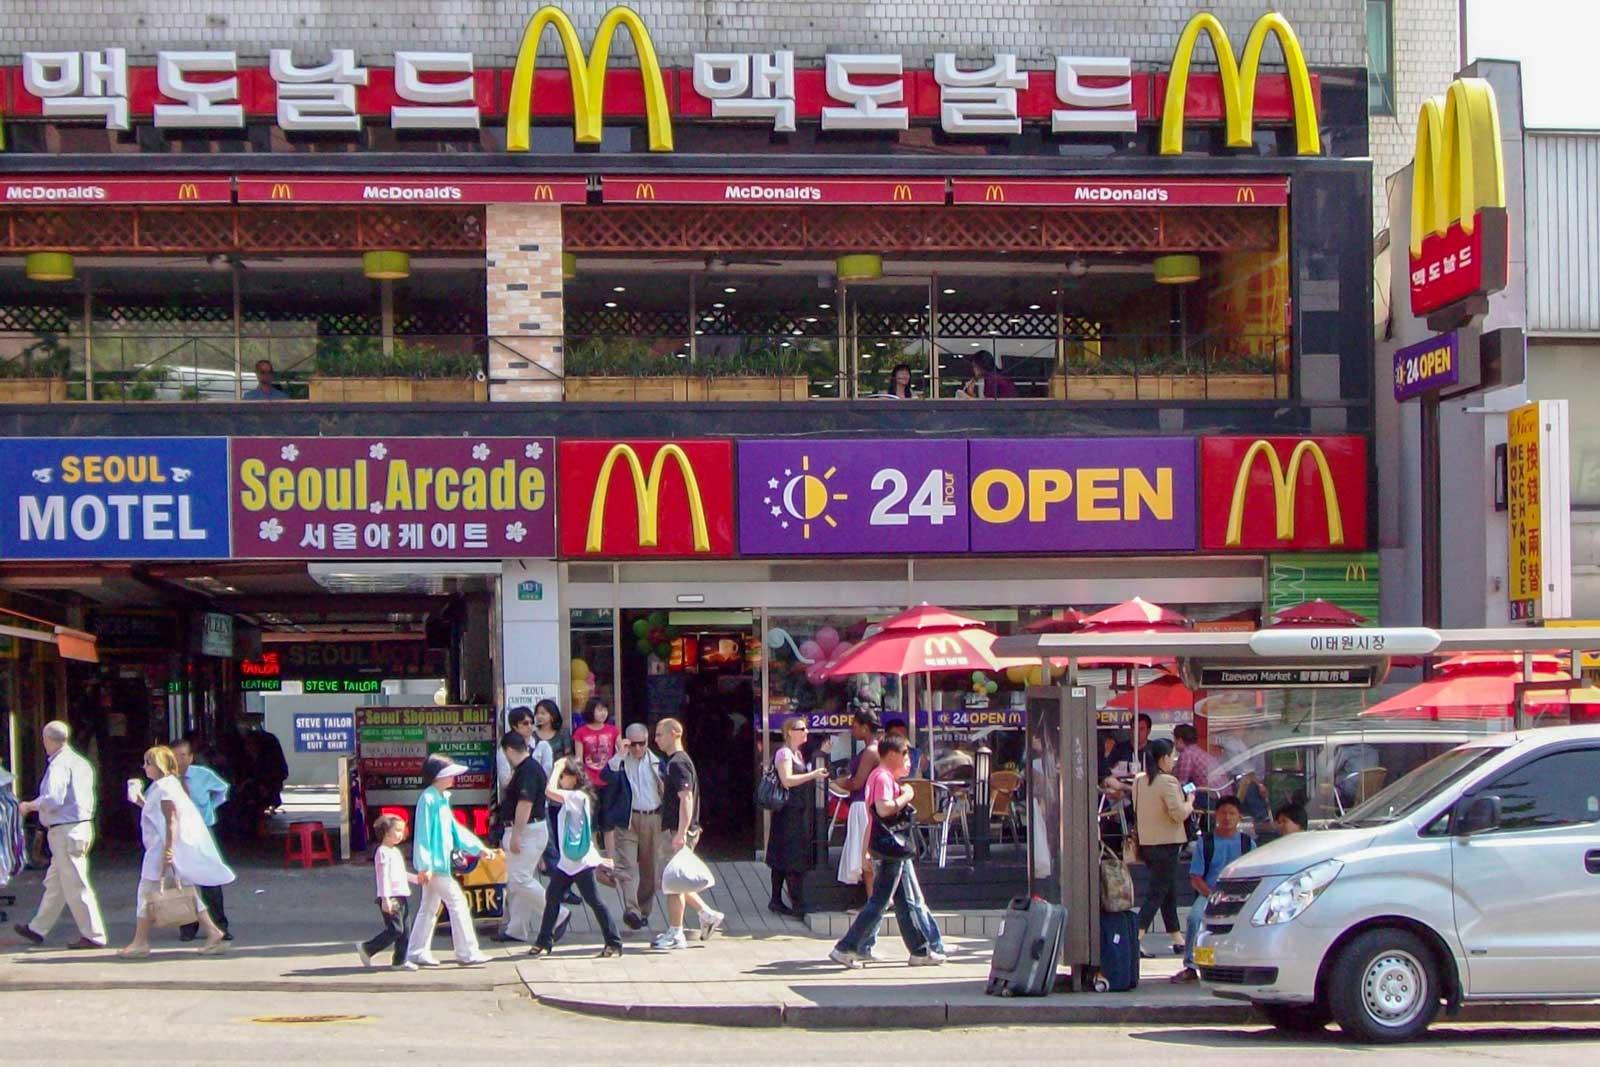 McDonalds in Seoul